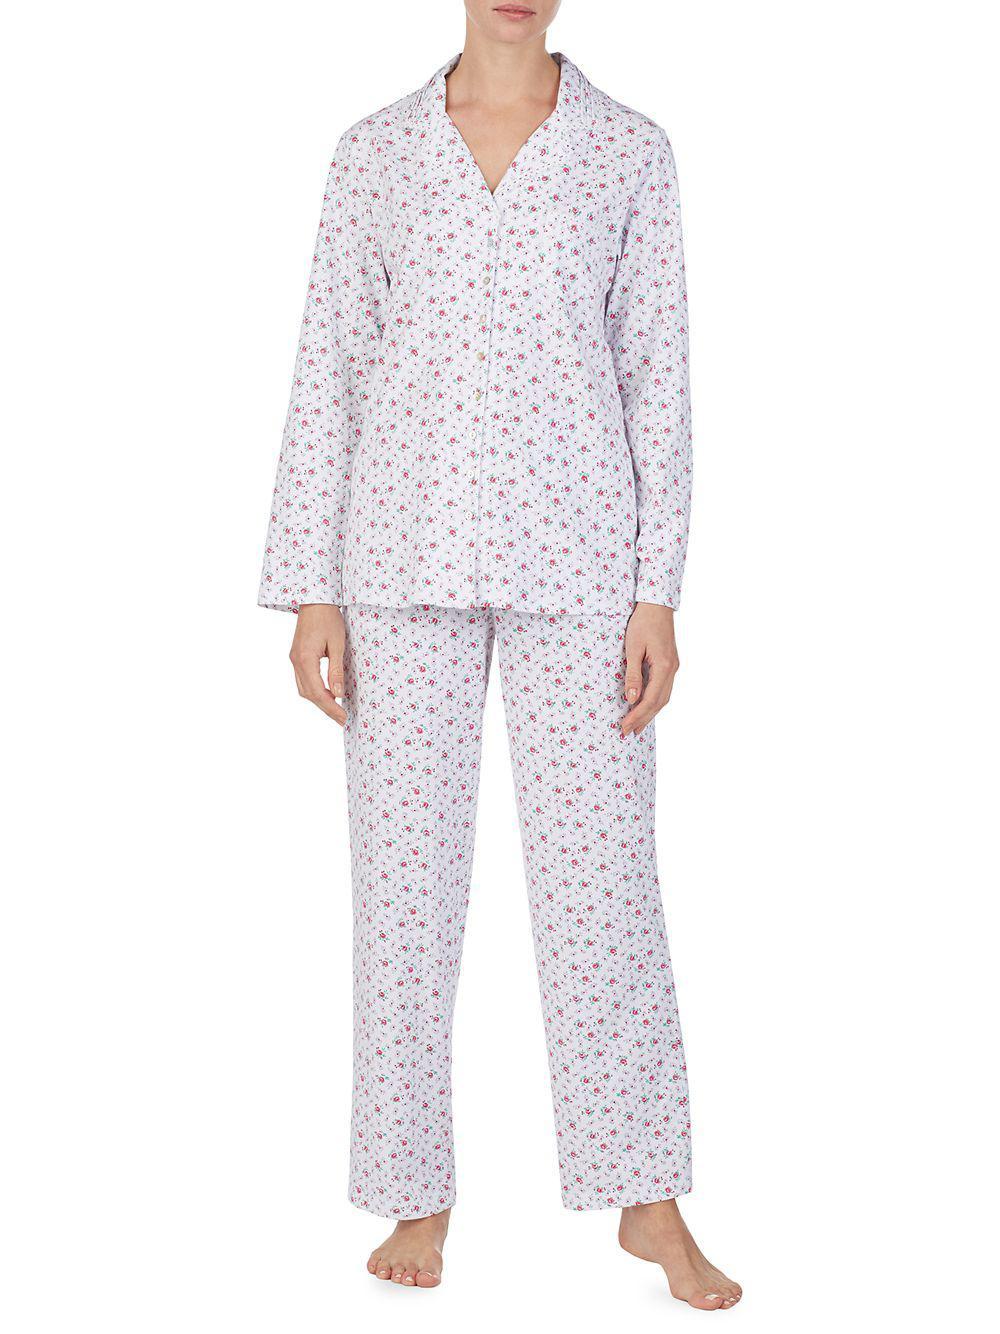 Eileen West. Women s Long-sleeve Floral Pajama Set 08be1d8e0